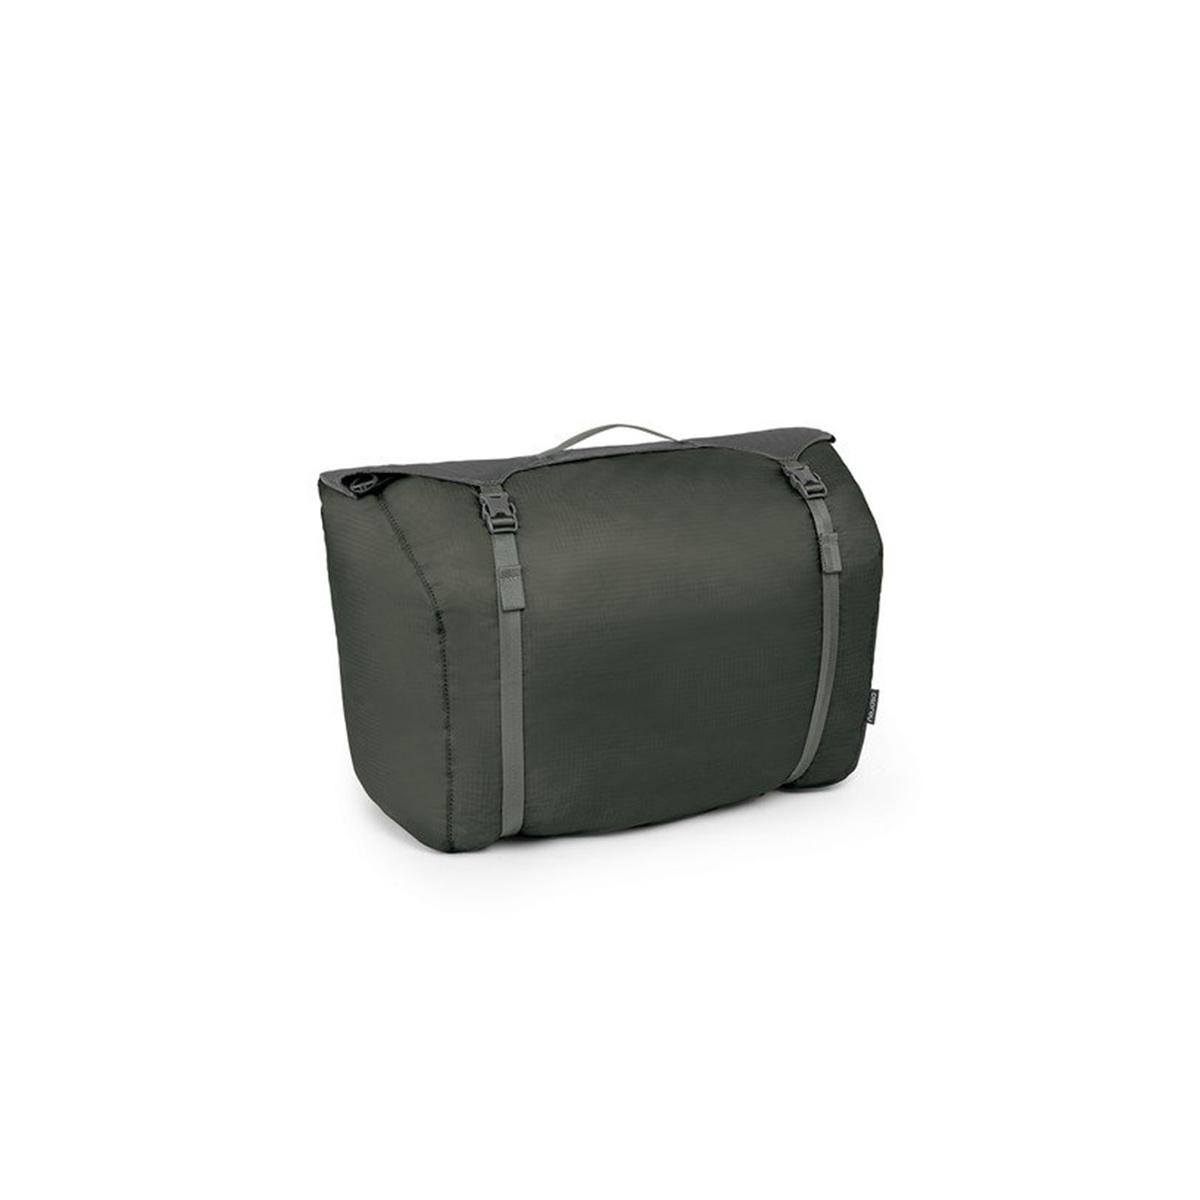 Osprey Packs StraightJacket Compression Sack 8